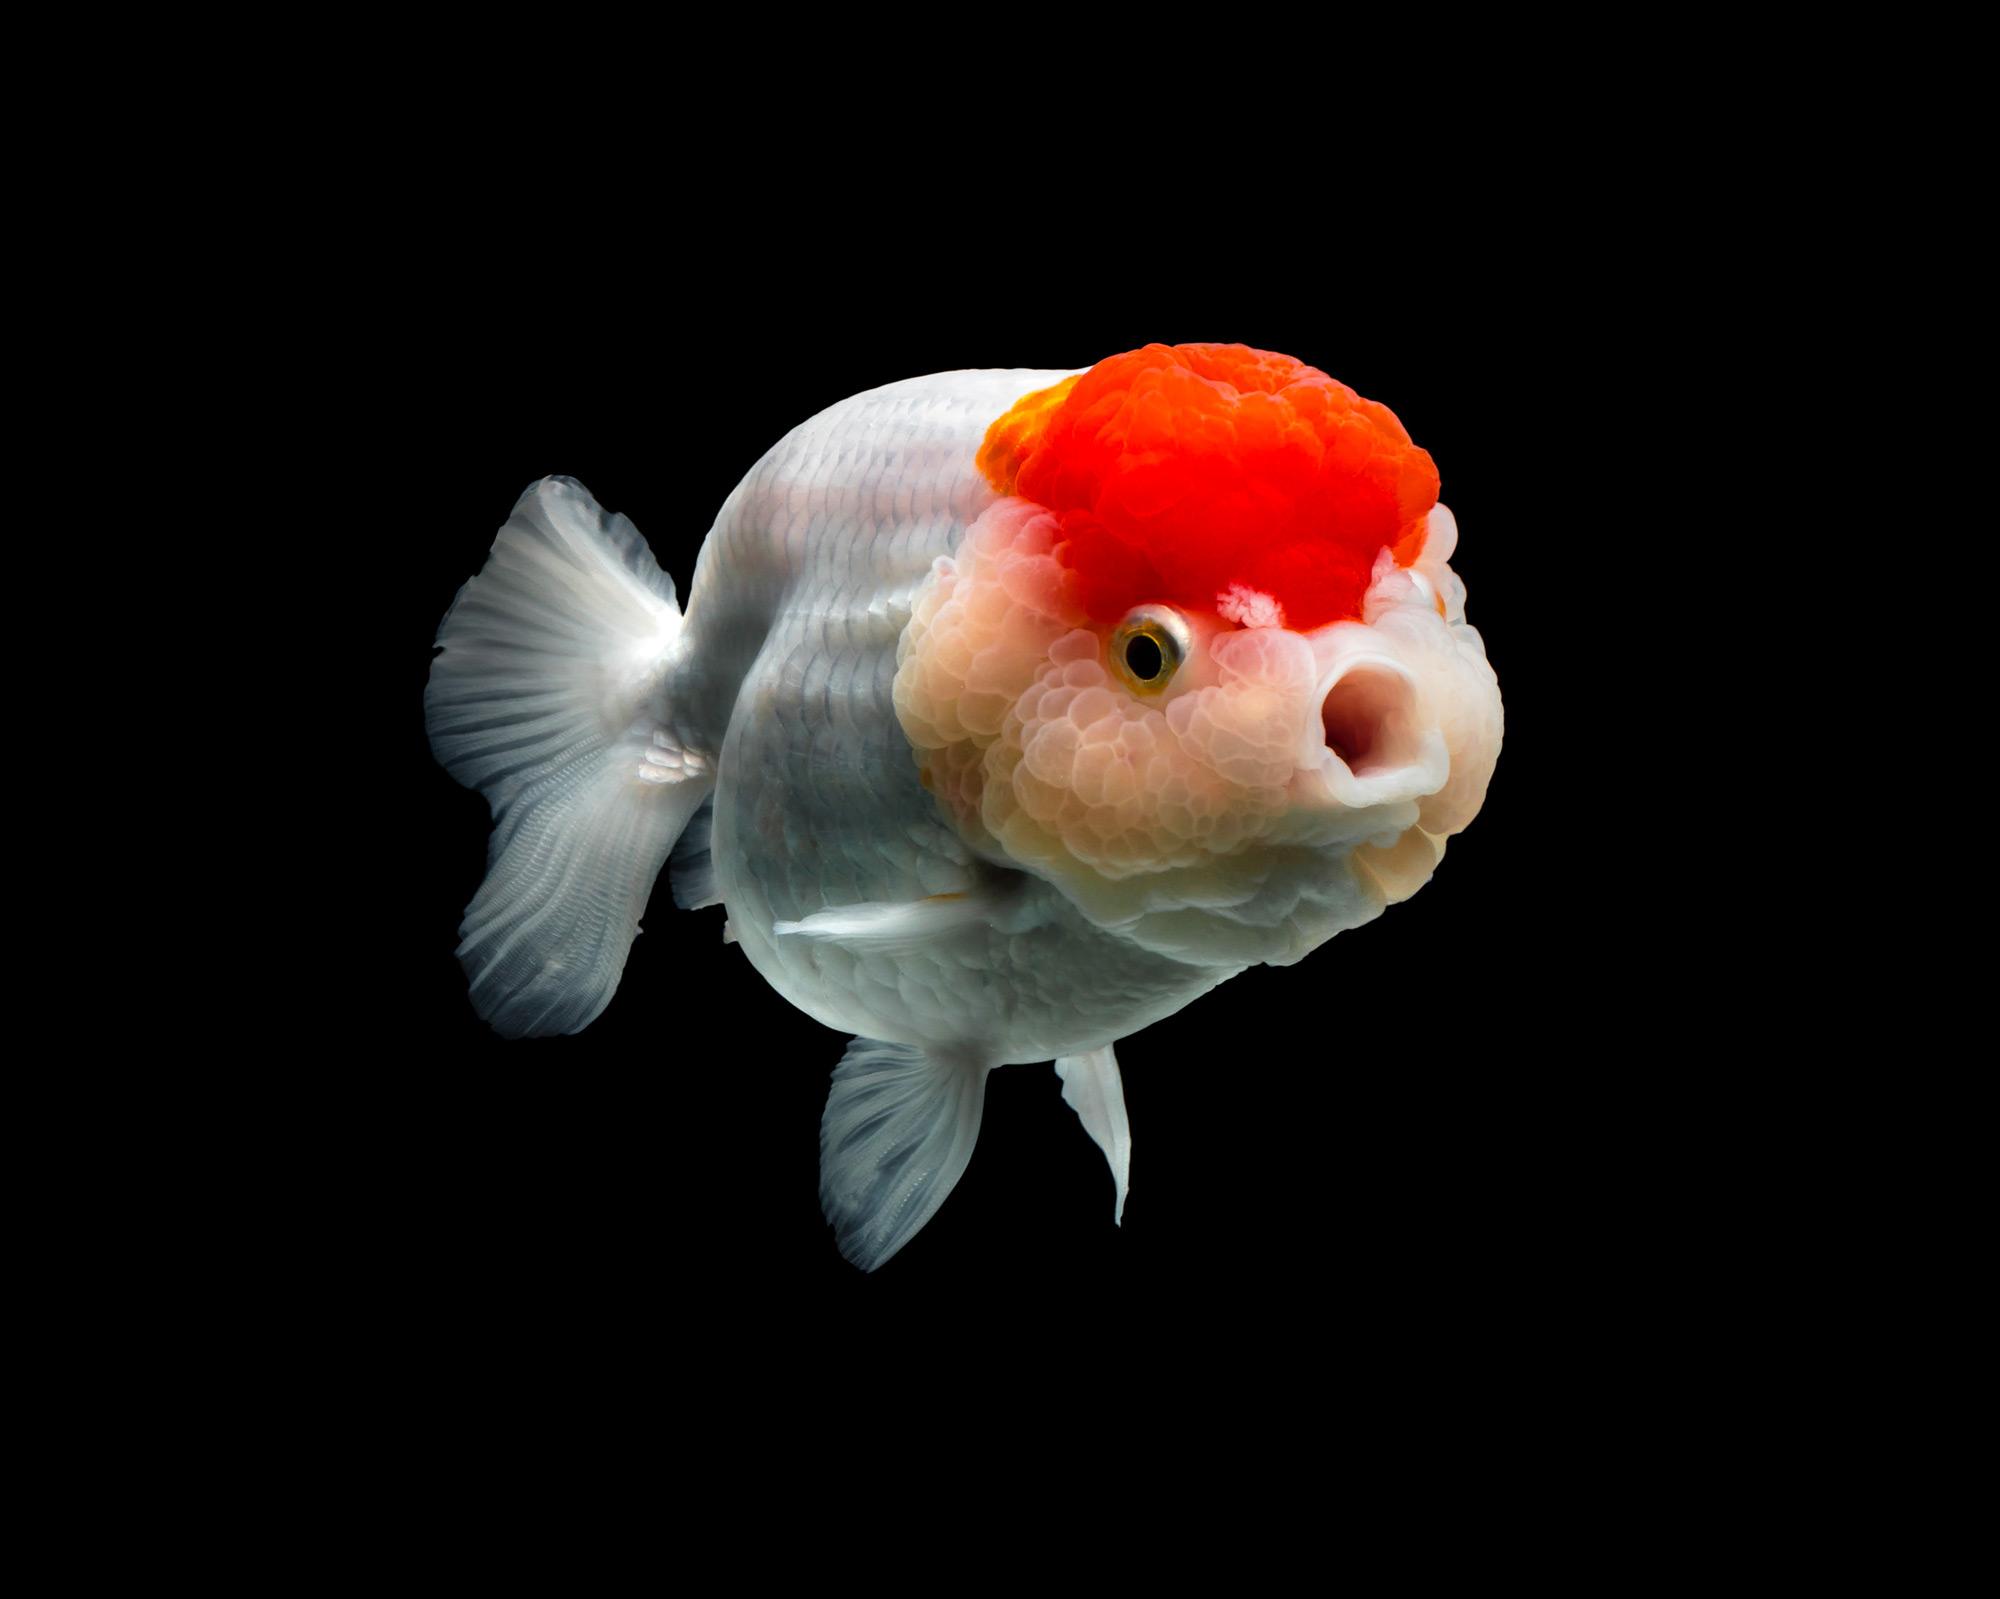 fish | Colossal